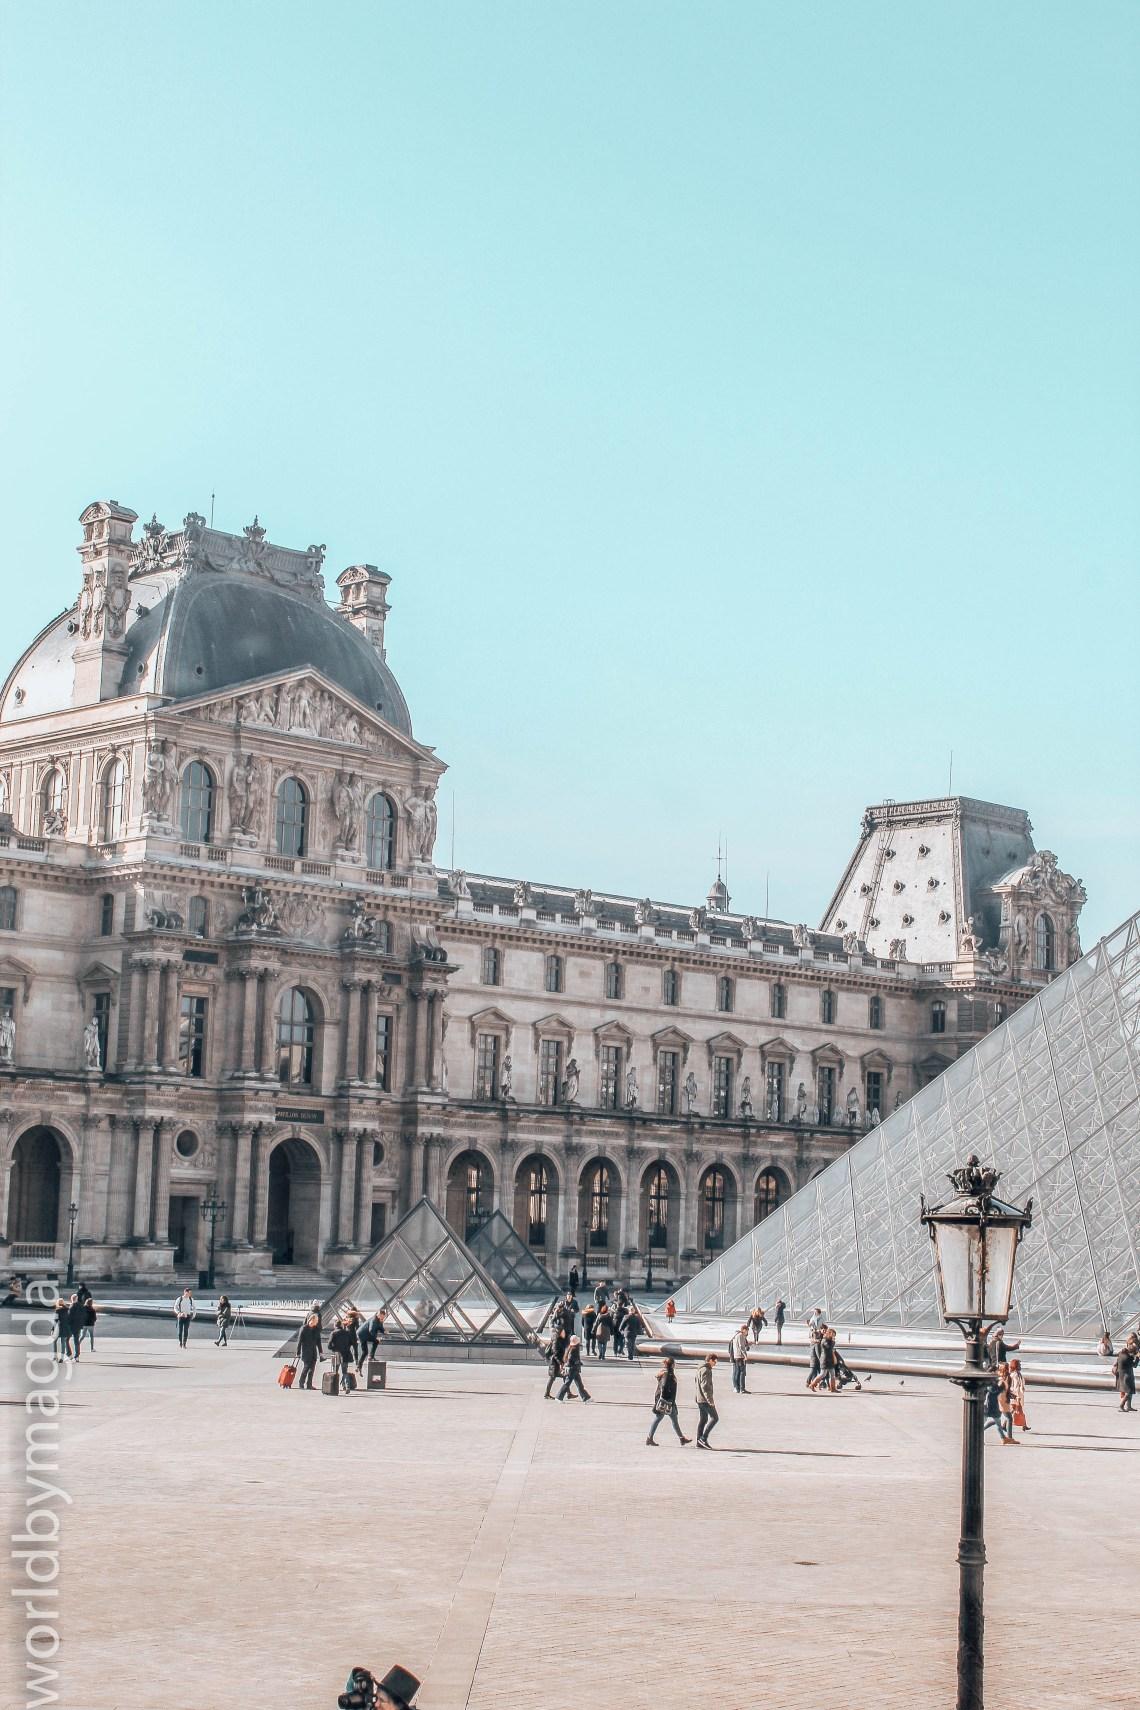 Louvre, Pavilon Richelieu with the Pyramid